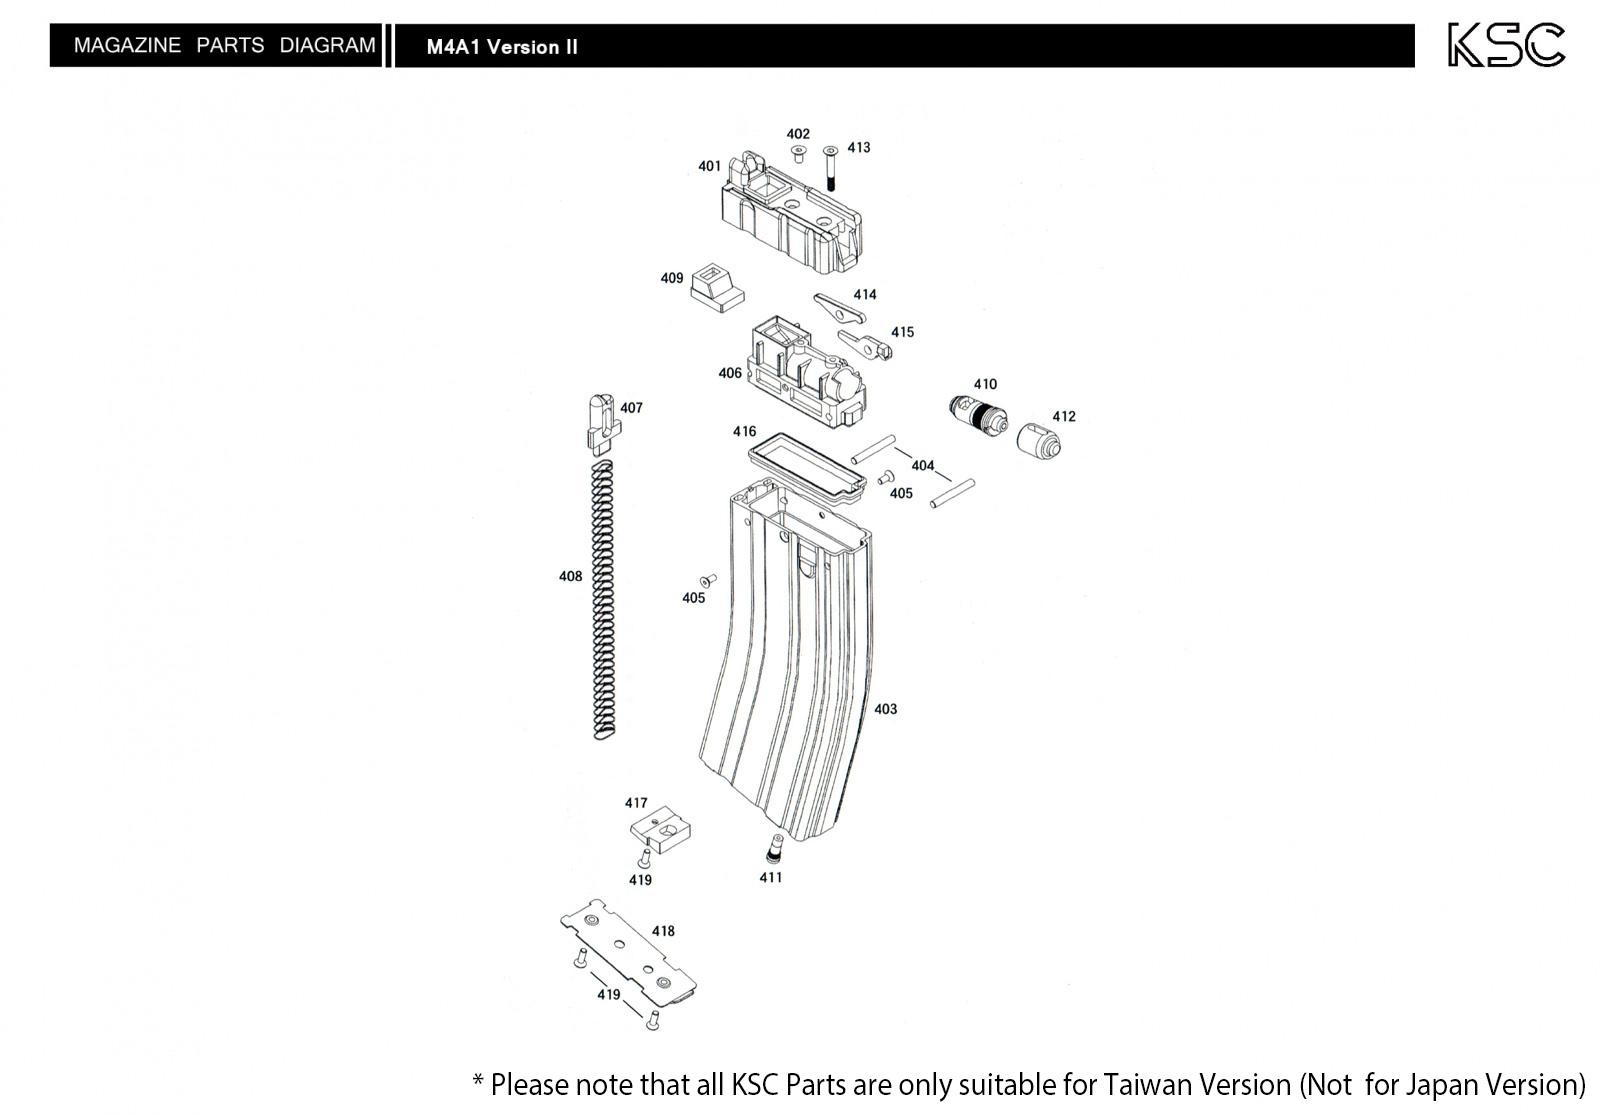 M4a1 Diagram Start Building A Wiring Glock Parts Version Ii Ksc Hk Rh Kwa Com M249